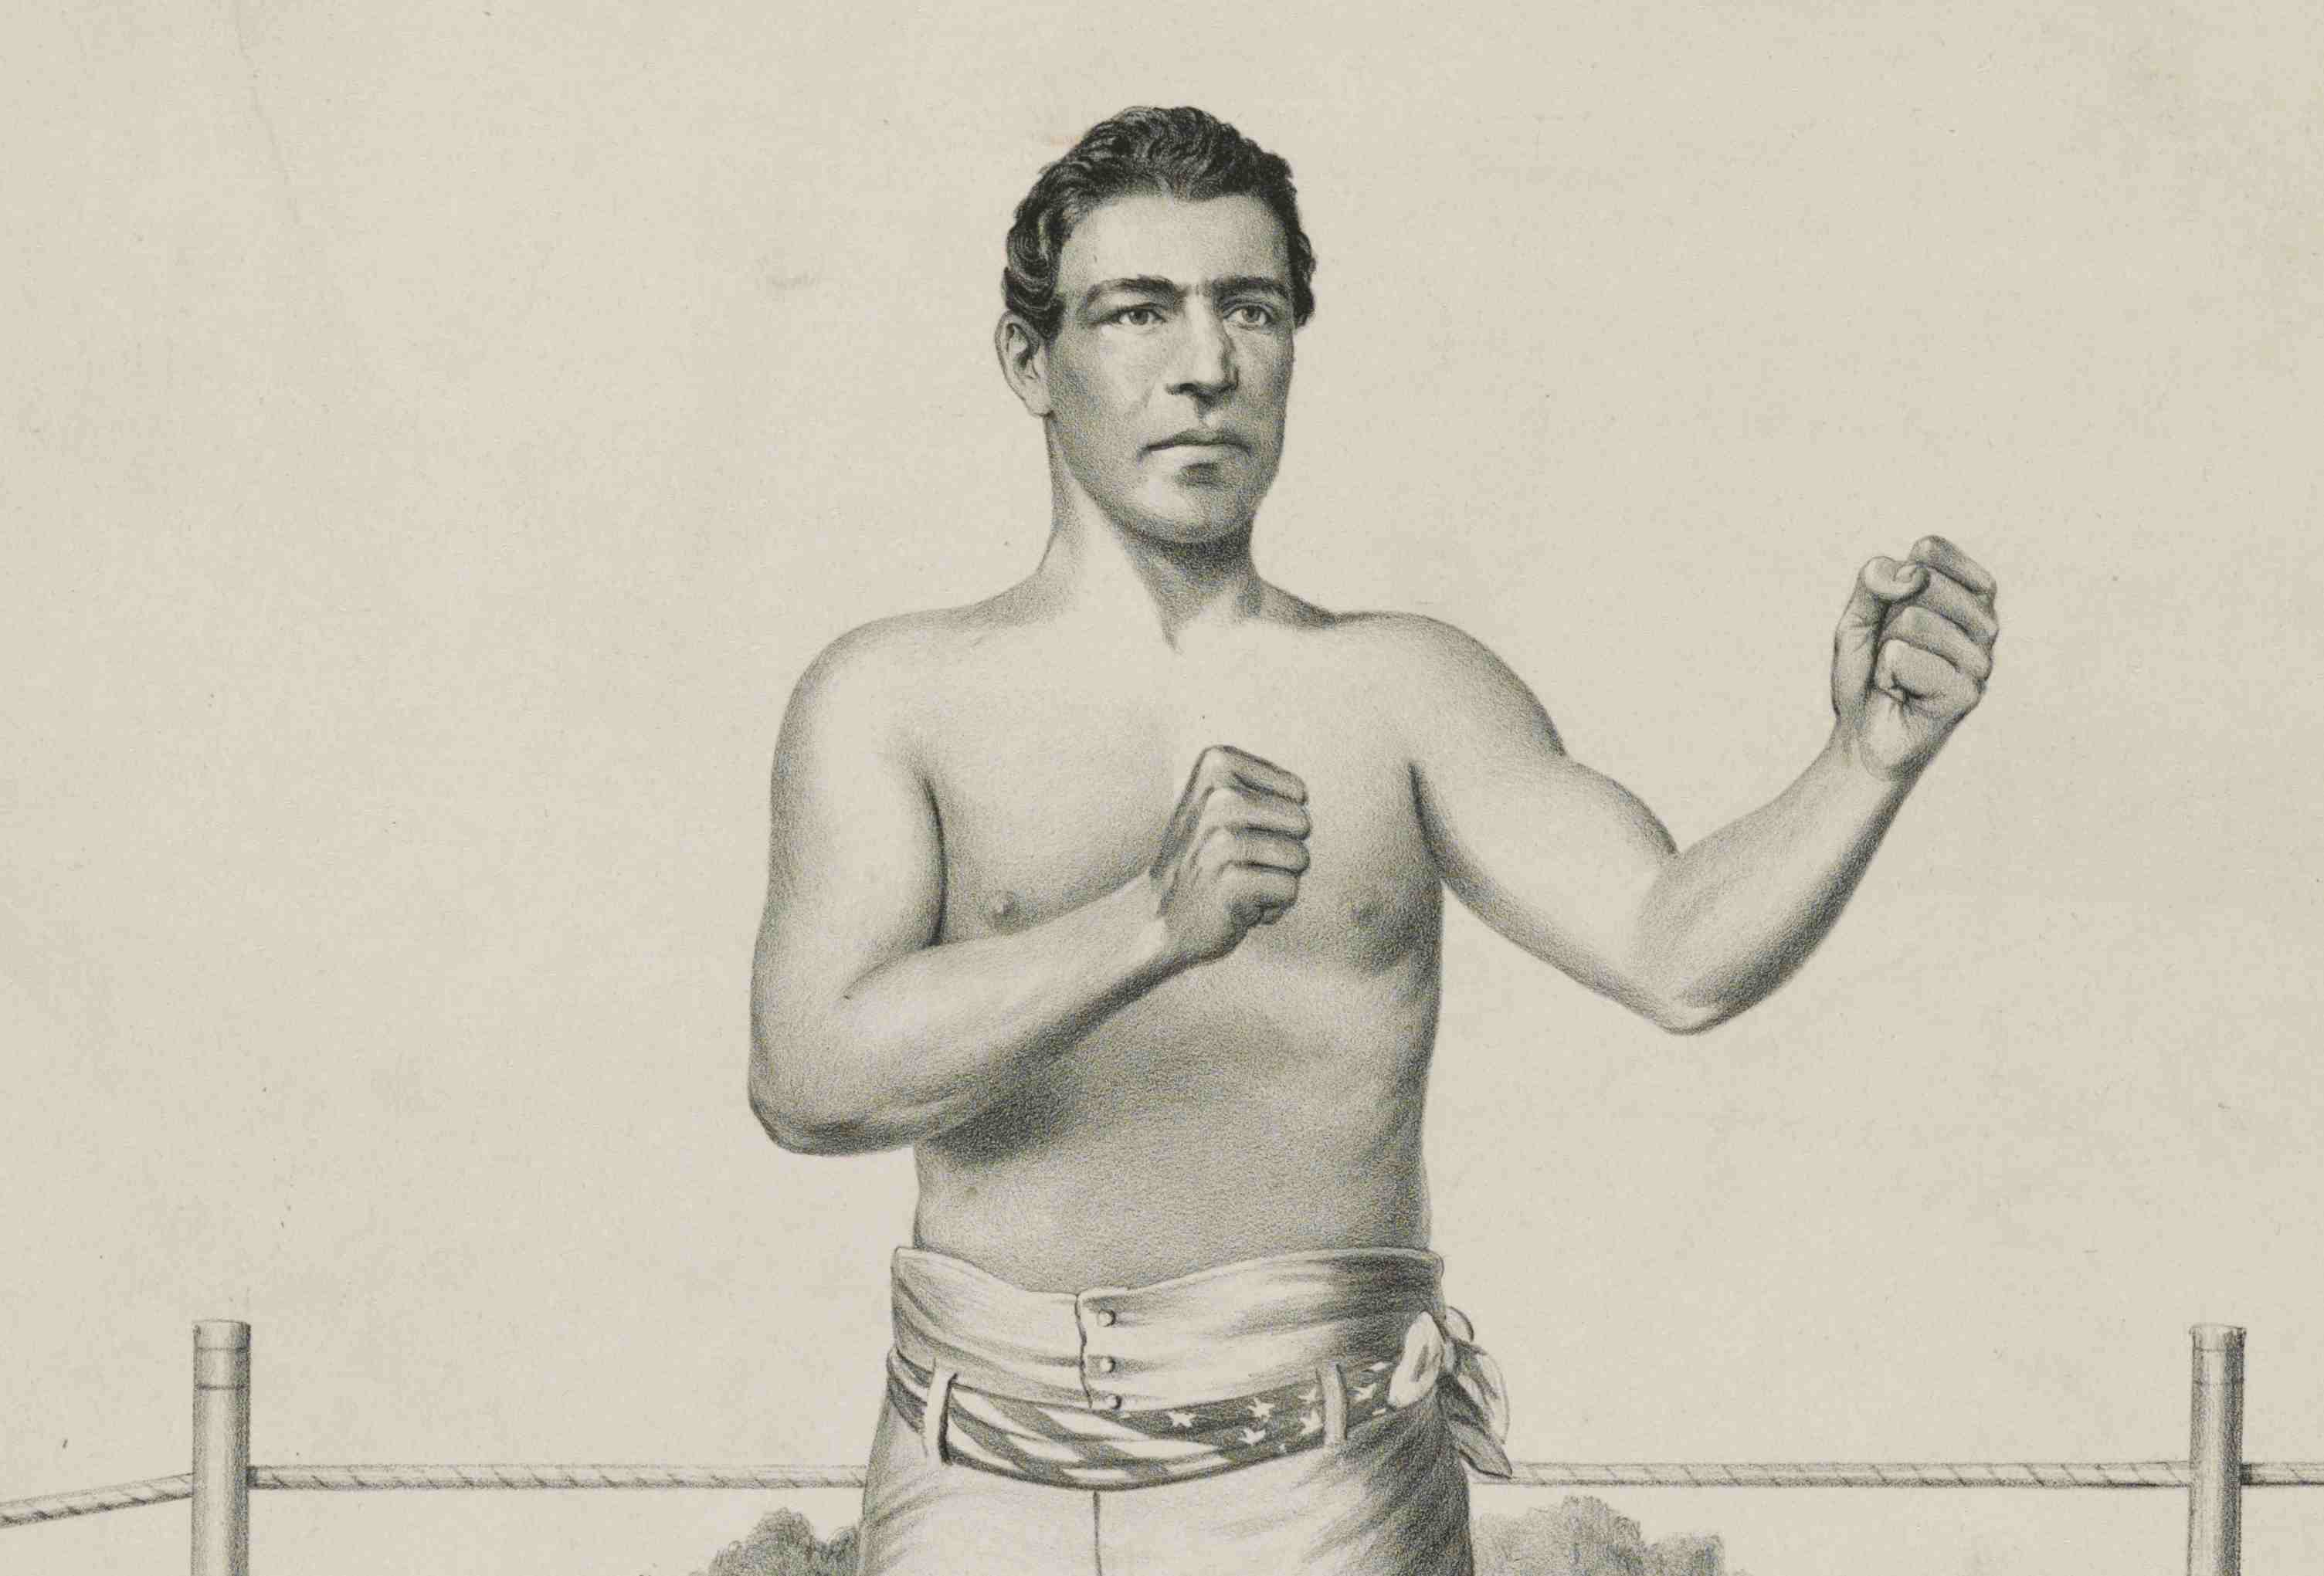 Lithograph of boxer John Morrissey